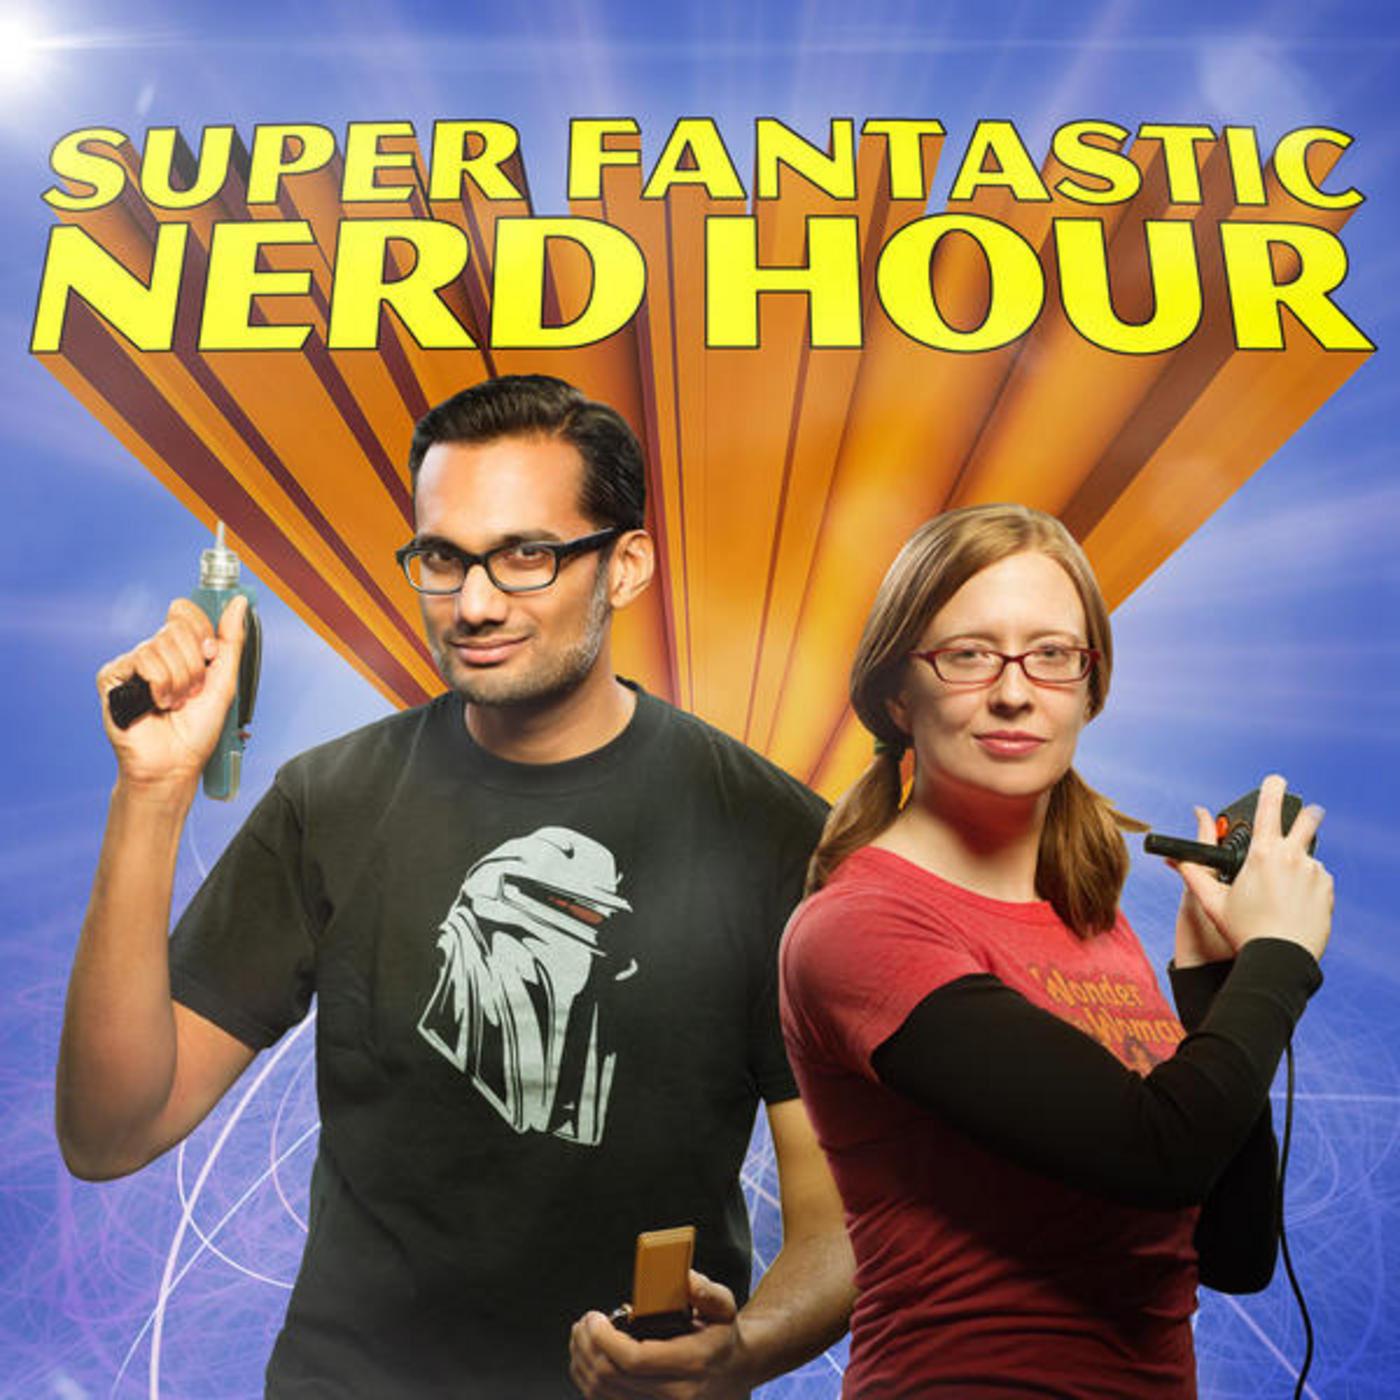 Episode 17: The Amazing Spider-Man 2, Peter Parker VS. Hank McCoy, Top 5 Everyday Heroism Films